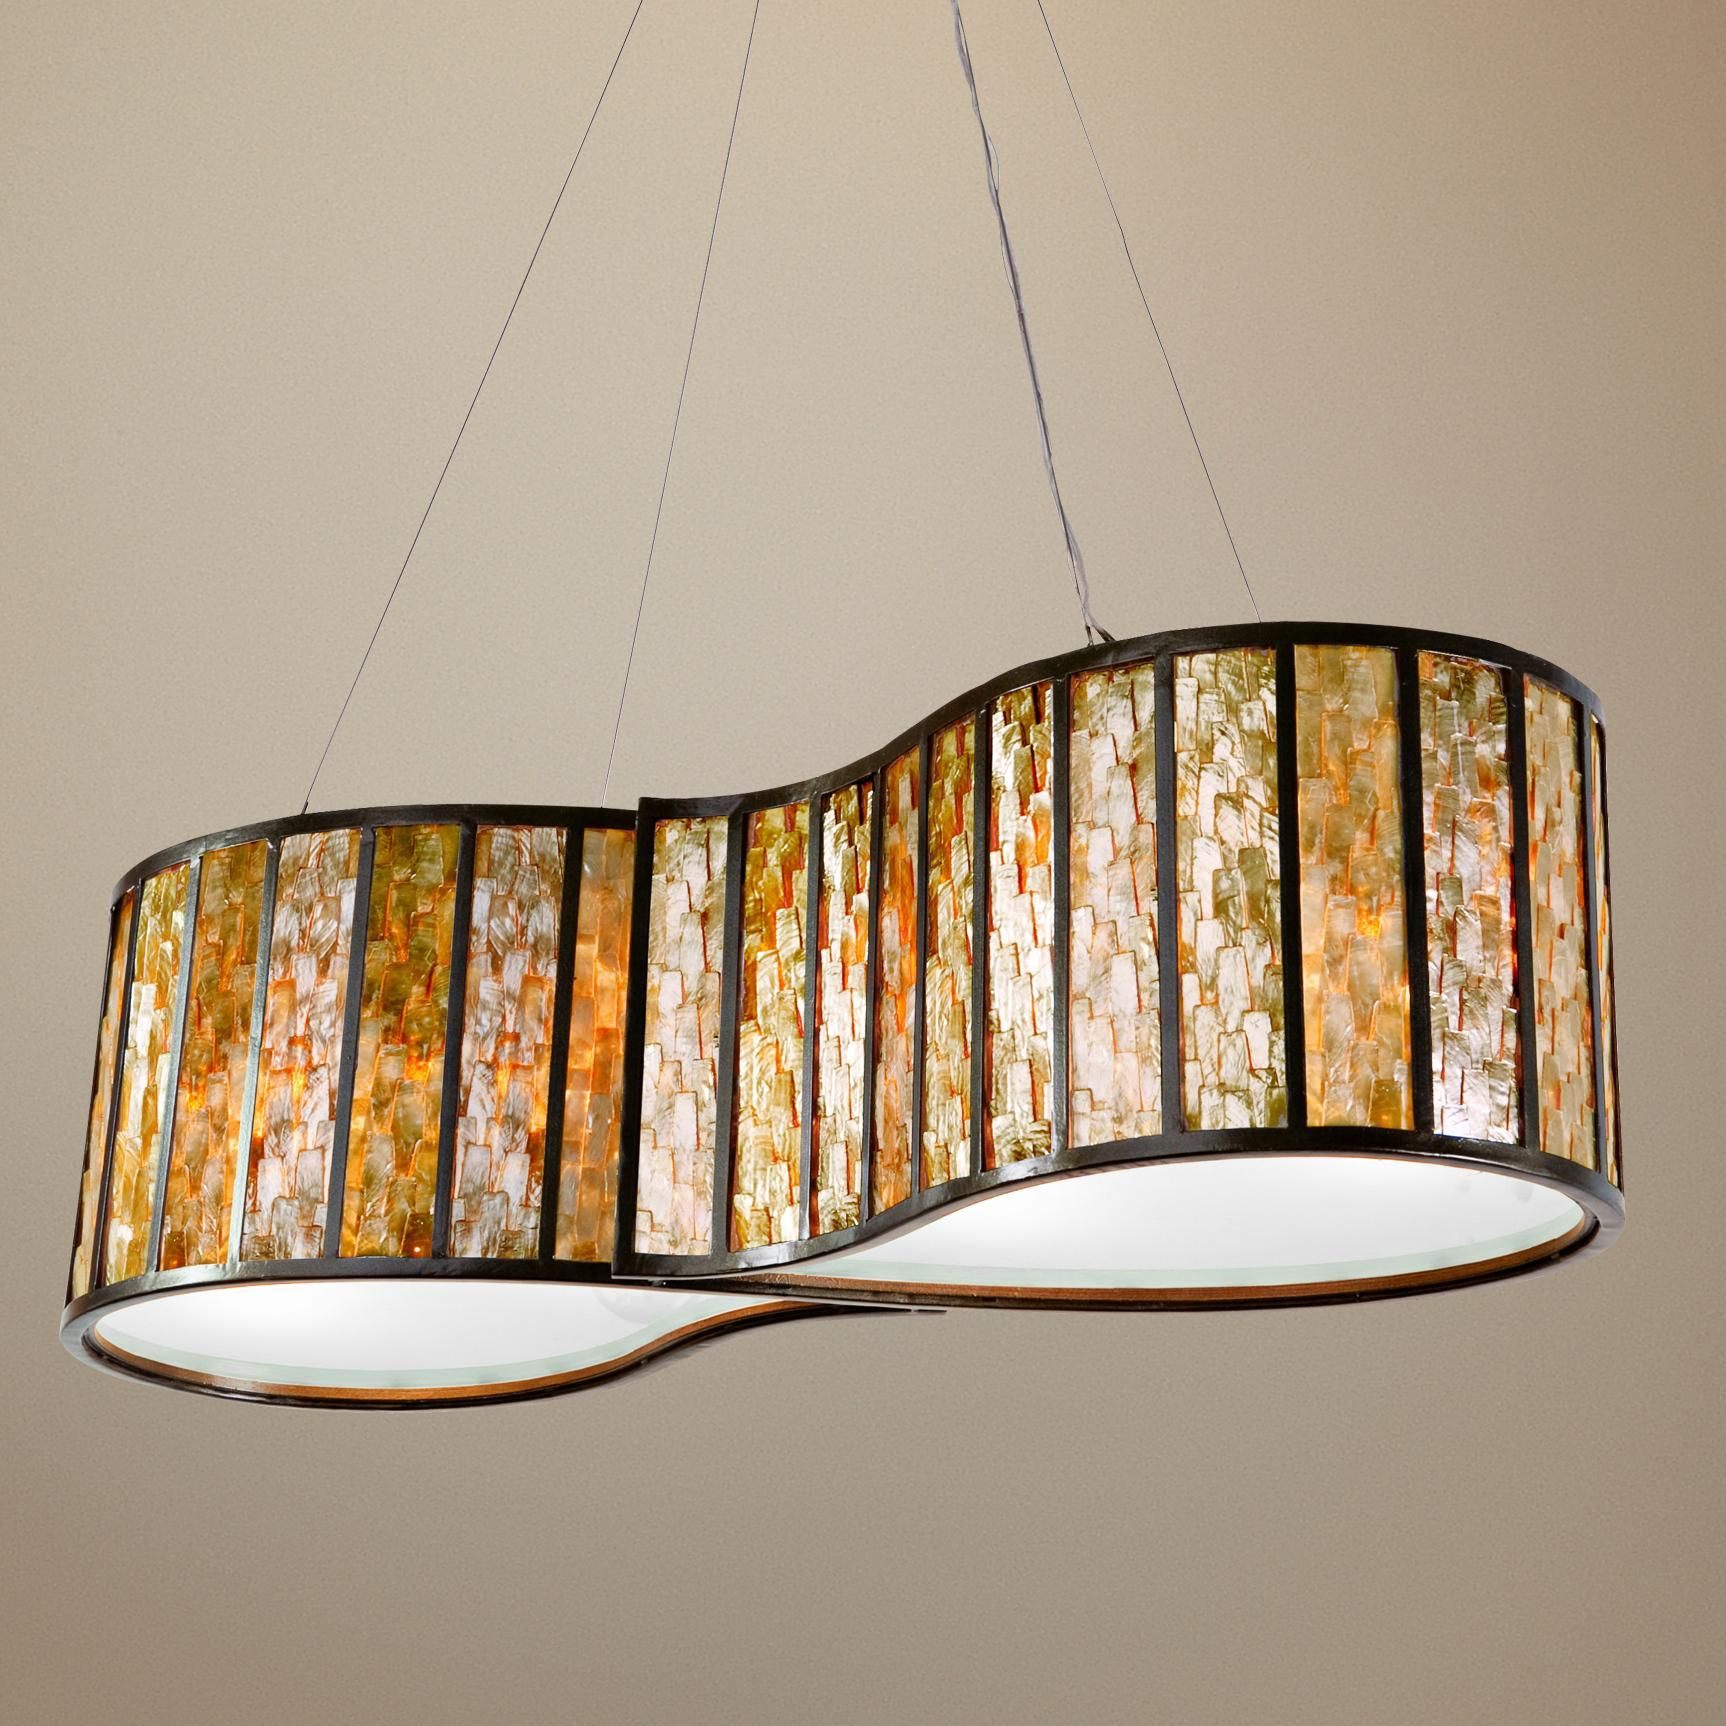 Varaluz Affinity Natural Capiz Shell 4 Light Pendant